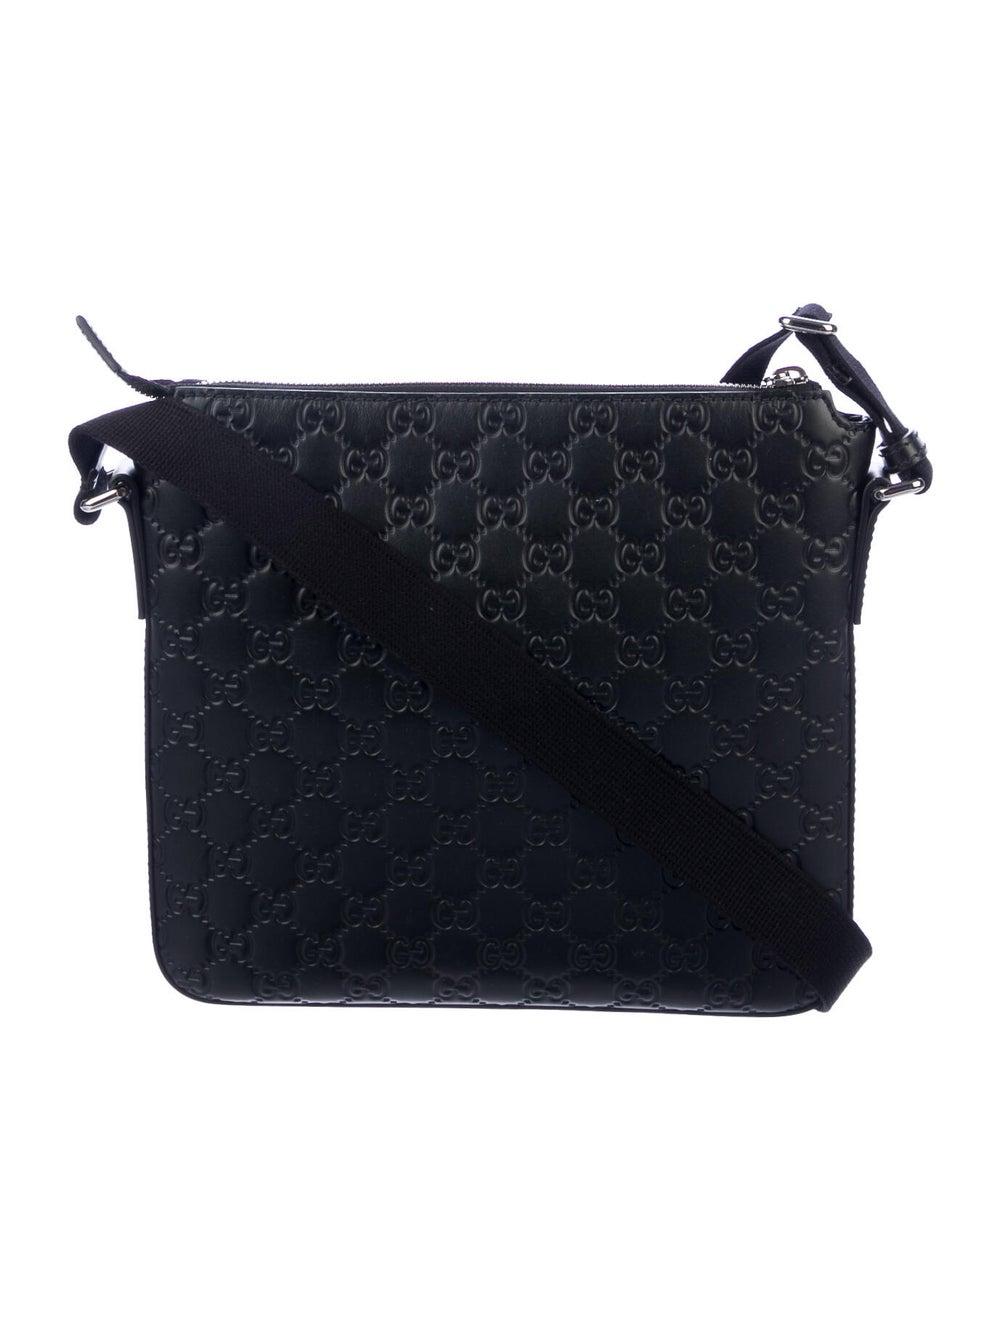 Gucci Signature Messenger Bag Black - image 4